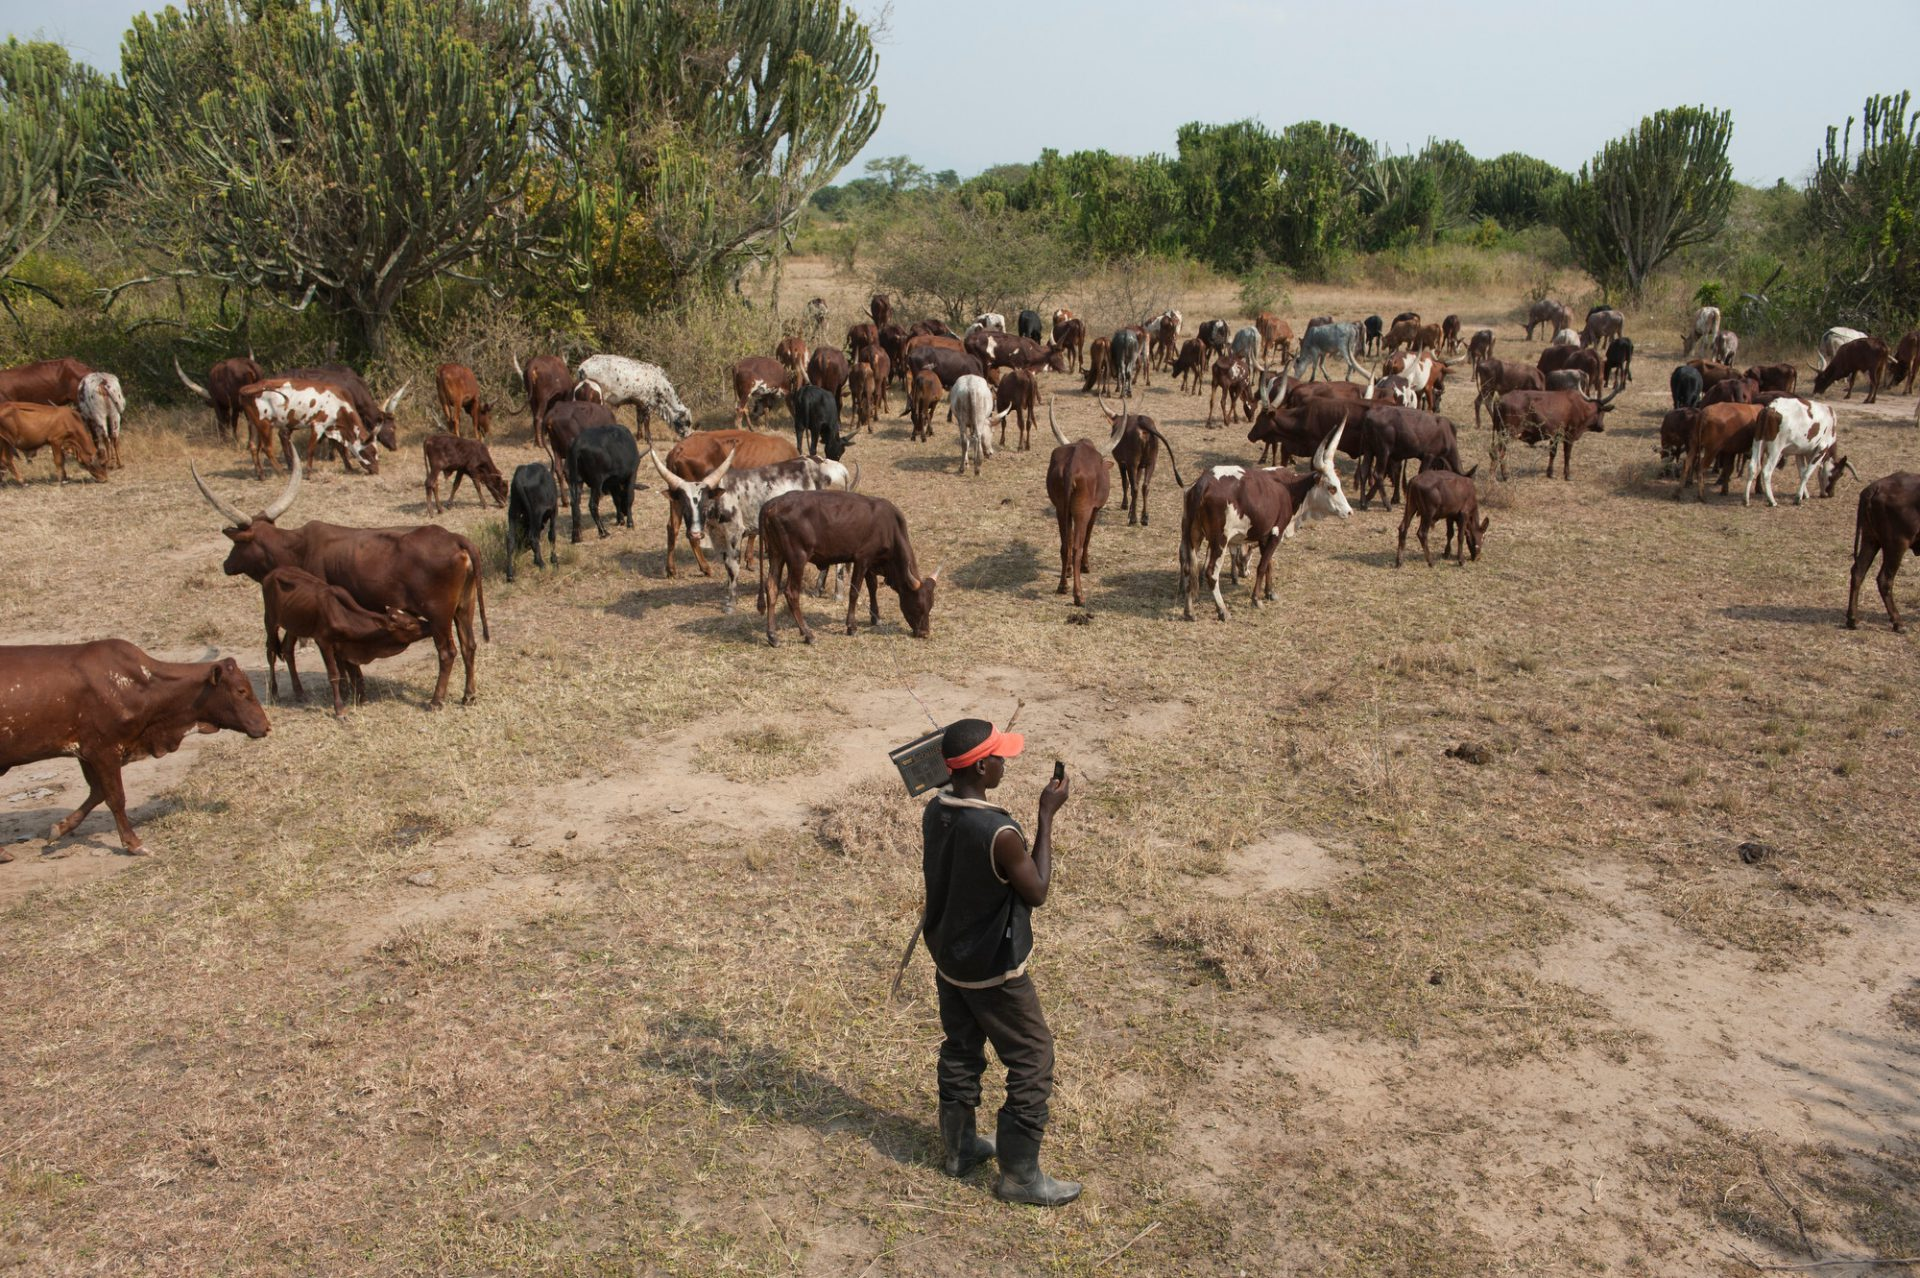 Photo: Herders graze their stock illegally in Queen Elizabeth National Park.